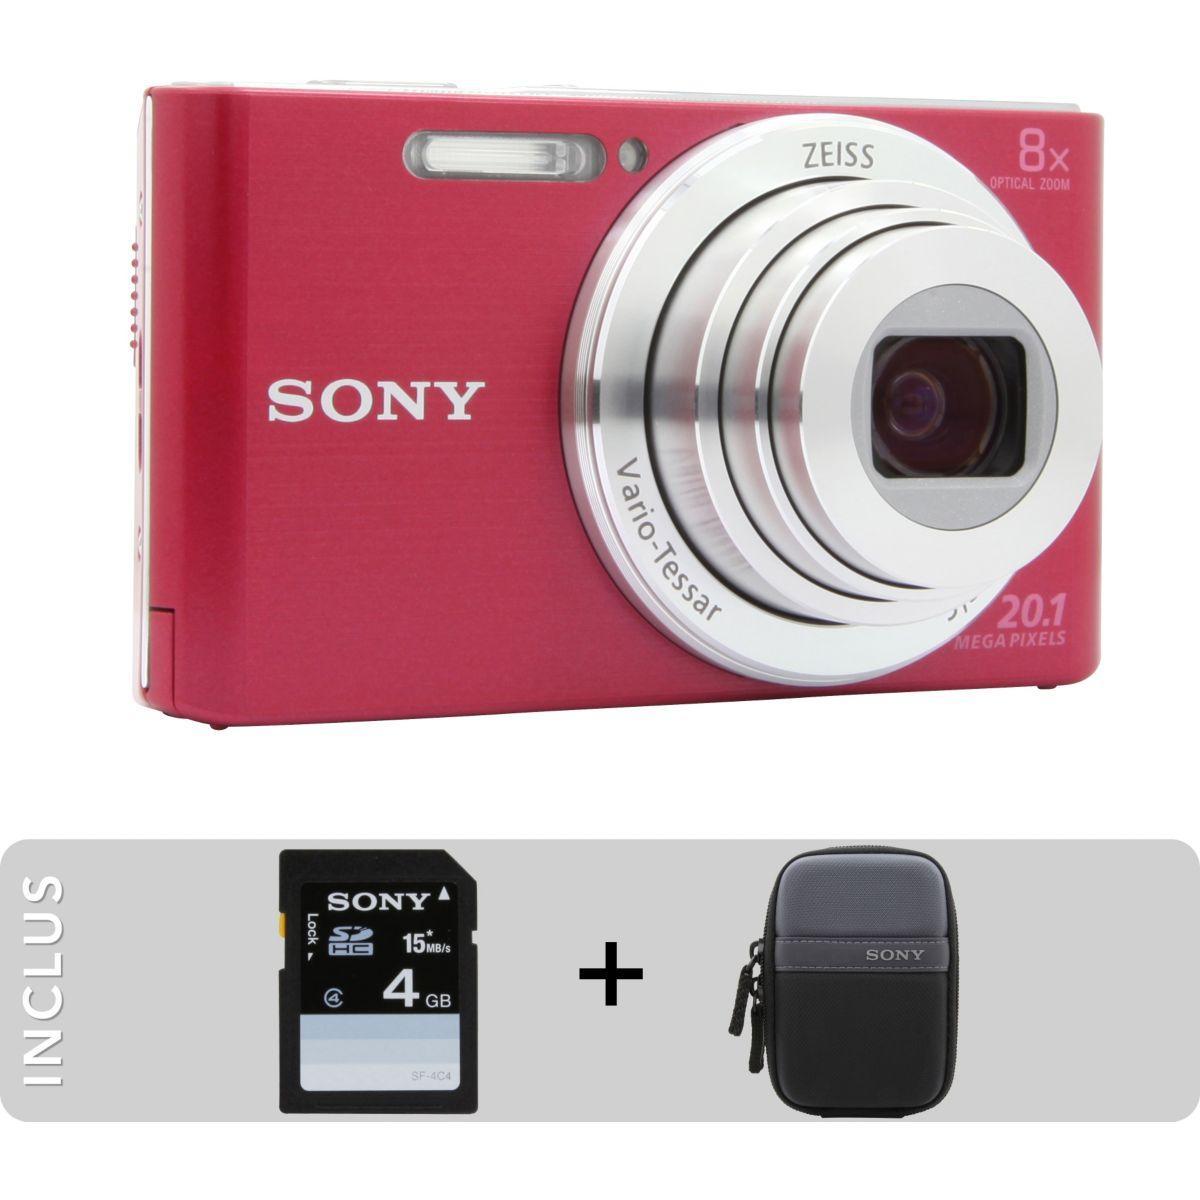 Appareil photo compact sony pack dsc-w830 rose + etui + sd 4go - livraison offerte : code livphoto (photo)